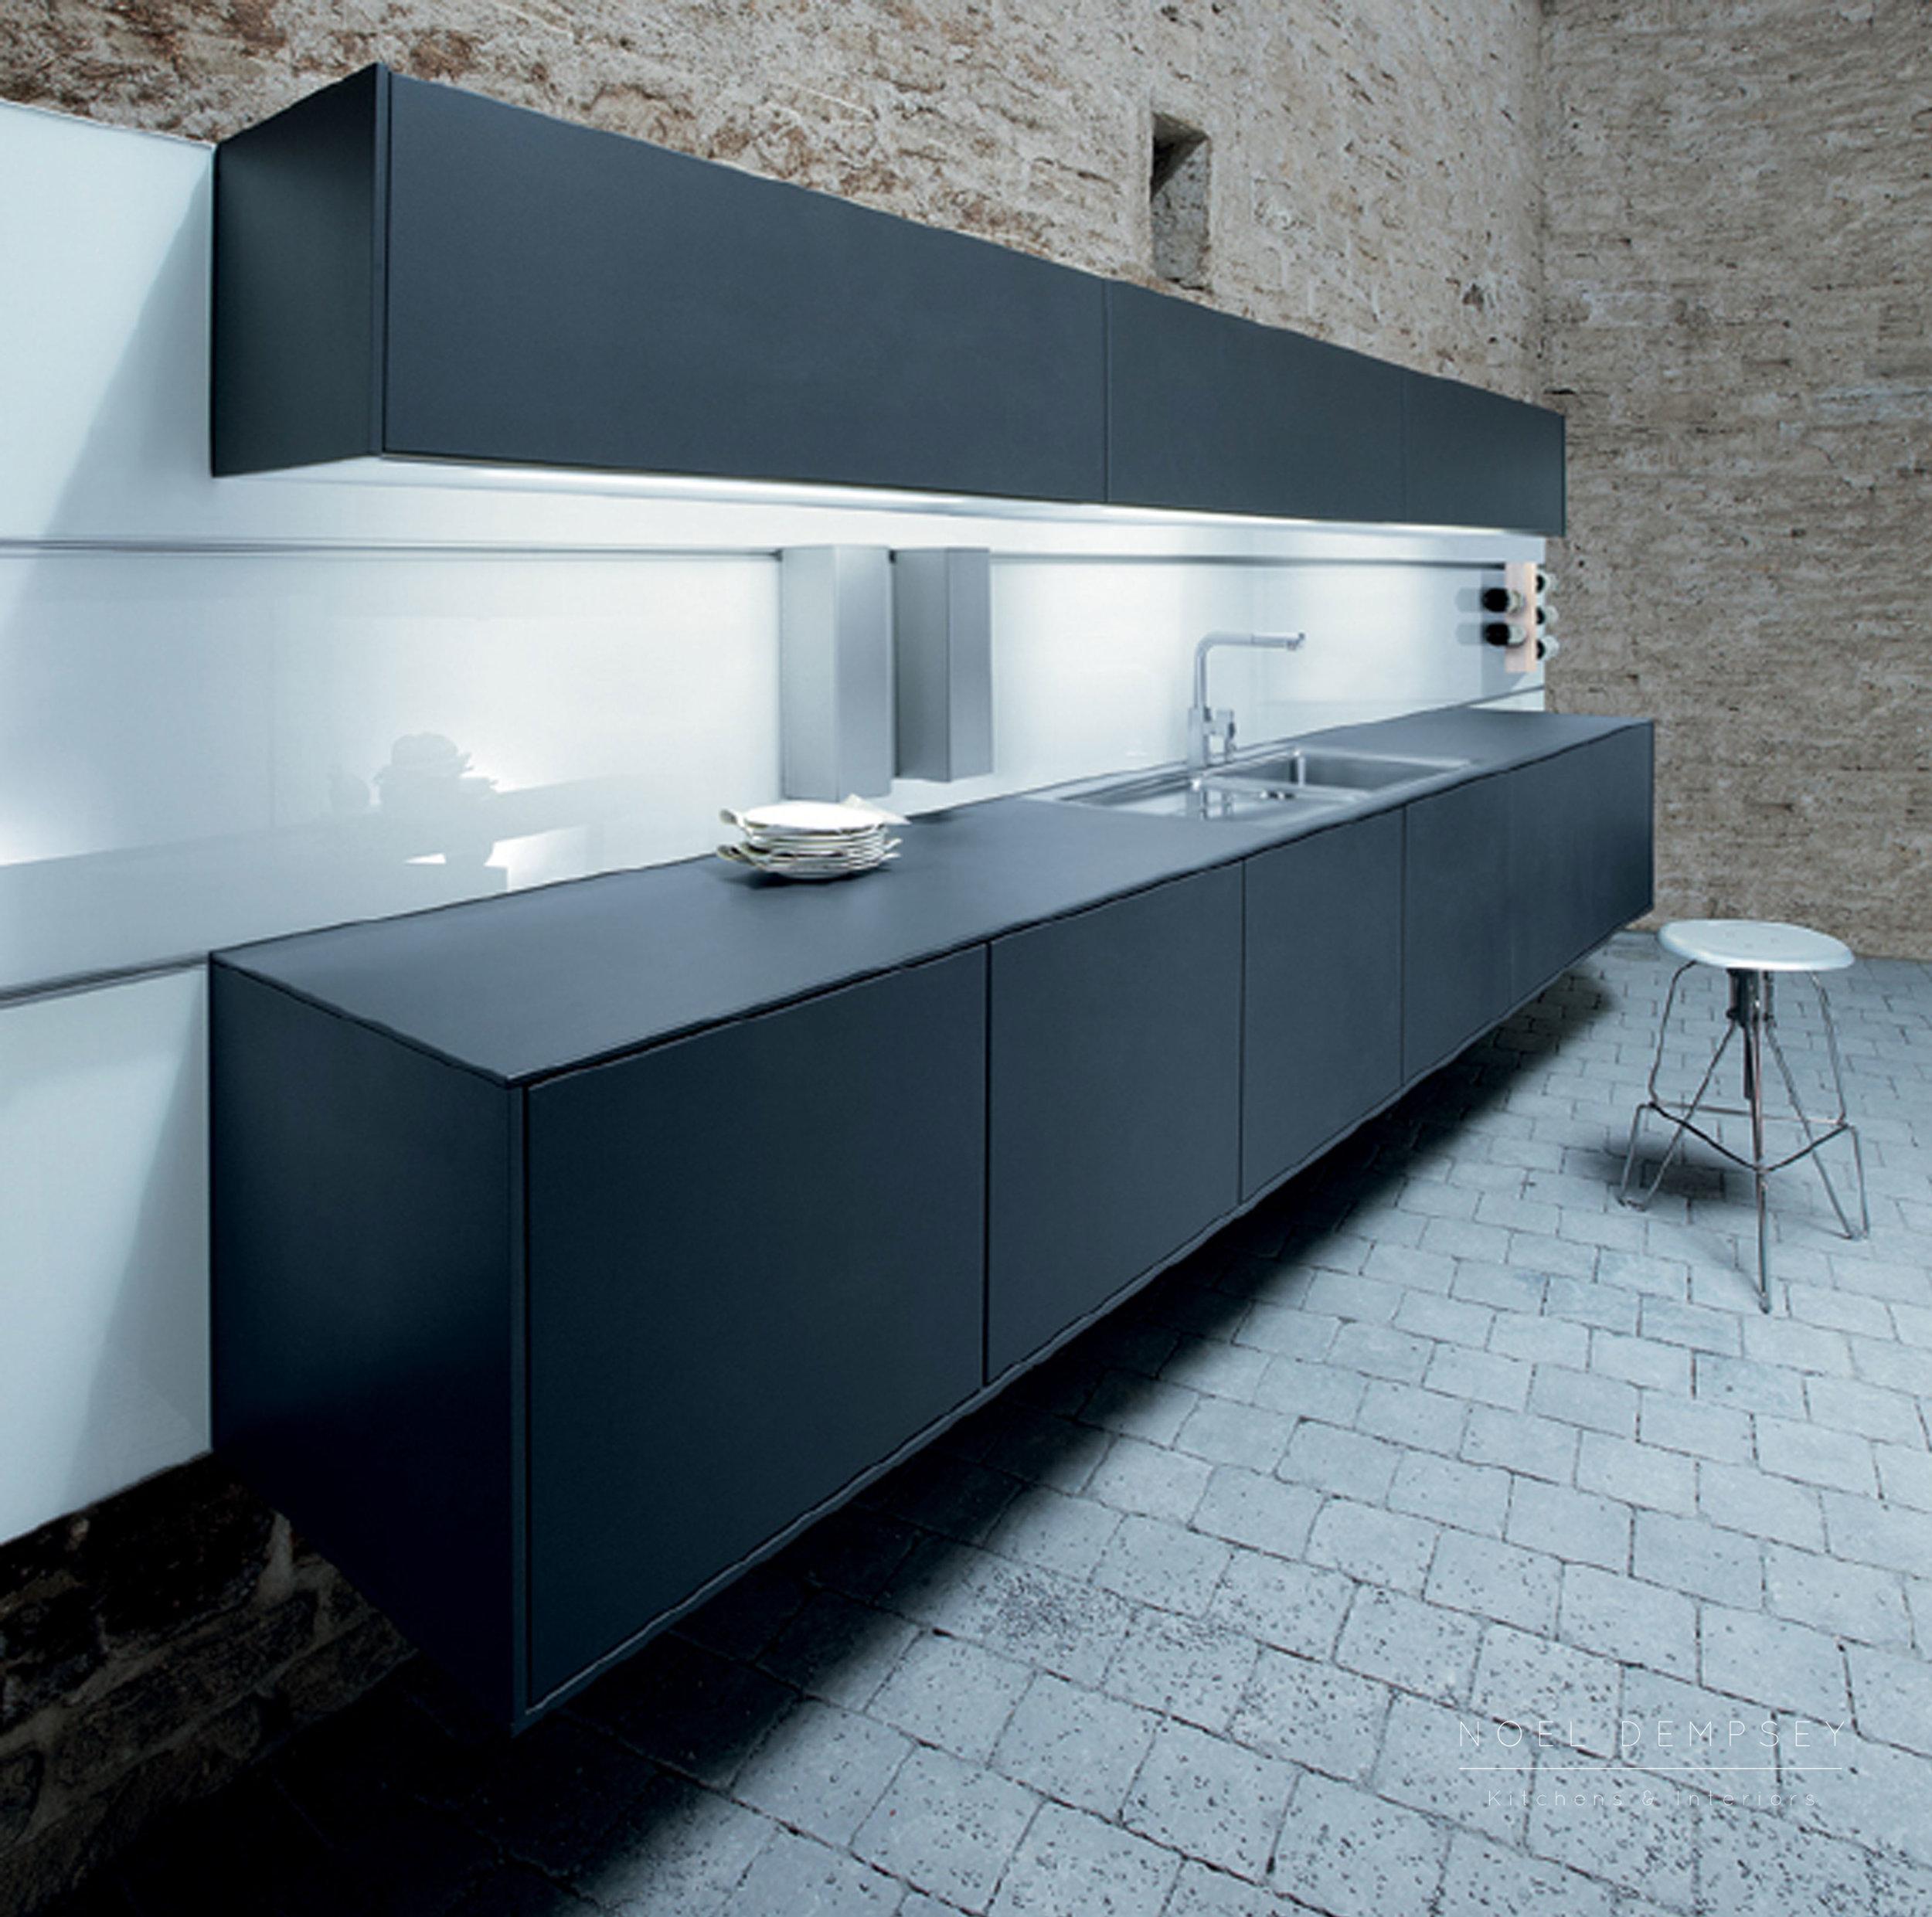 NX500-Satin-Lava-Black-German-Kitchen-4.jpg